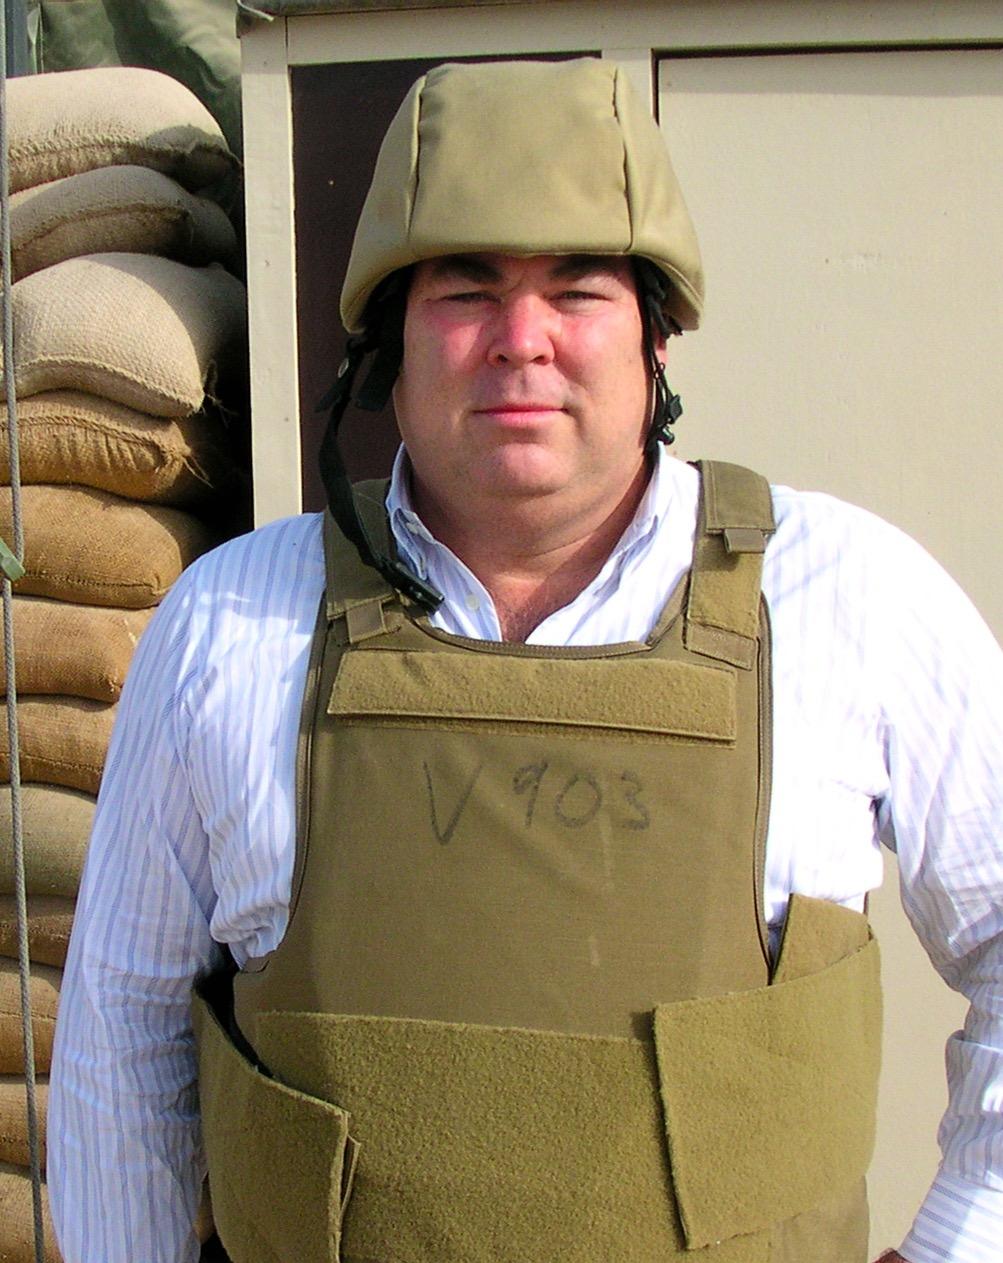 Camp Victory, Baghdad, Iraq